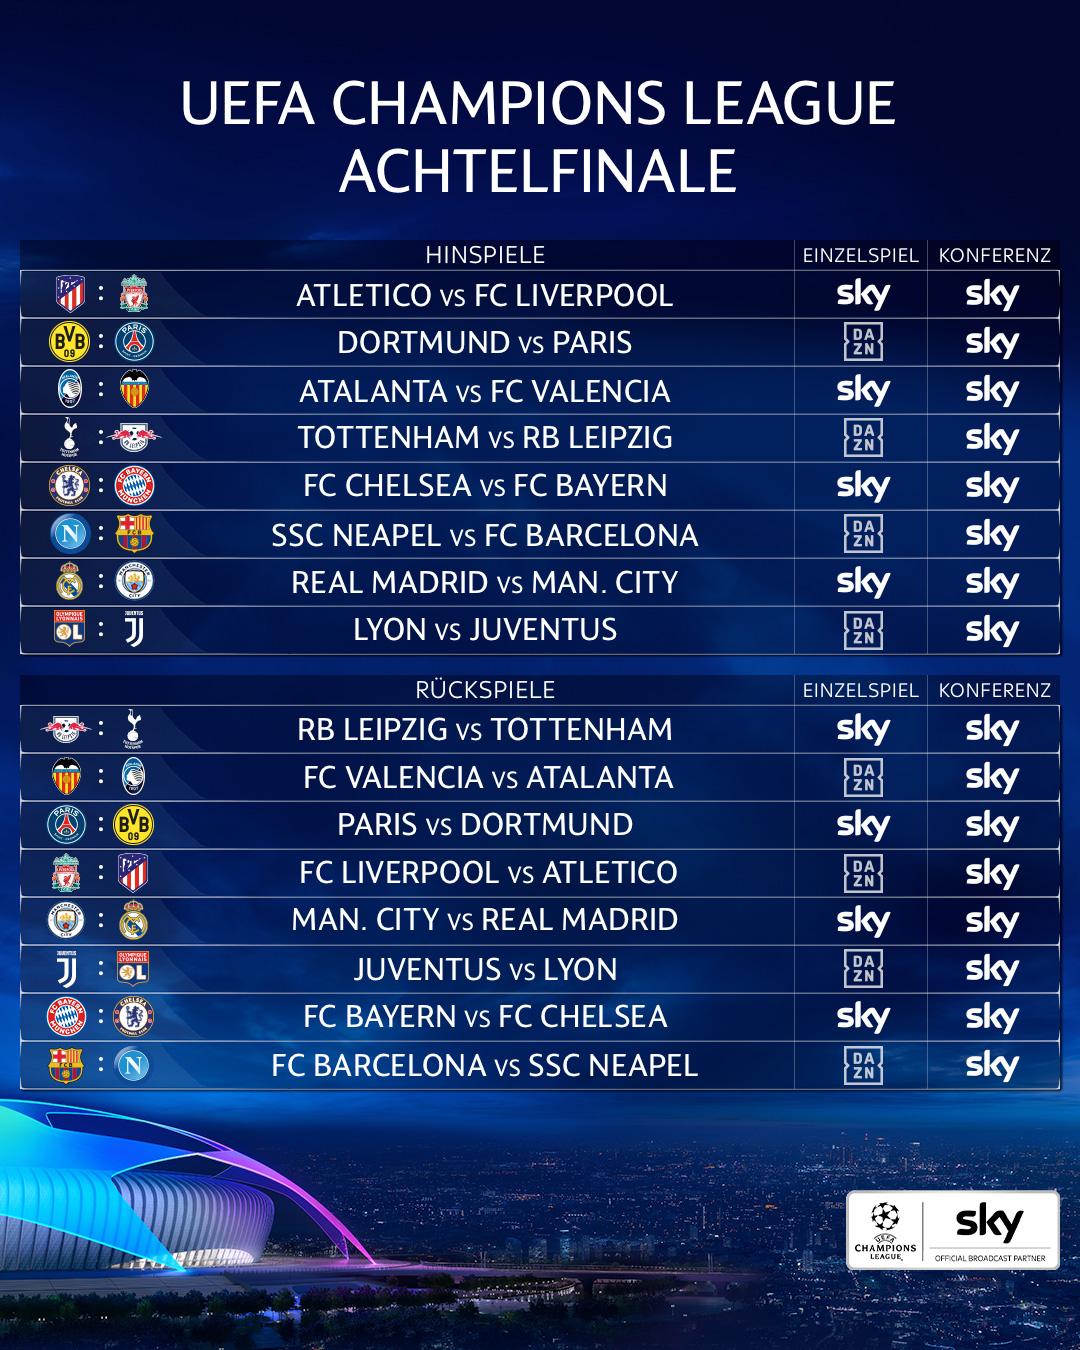 Champions League Spielplan Achtelfinale